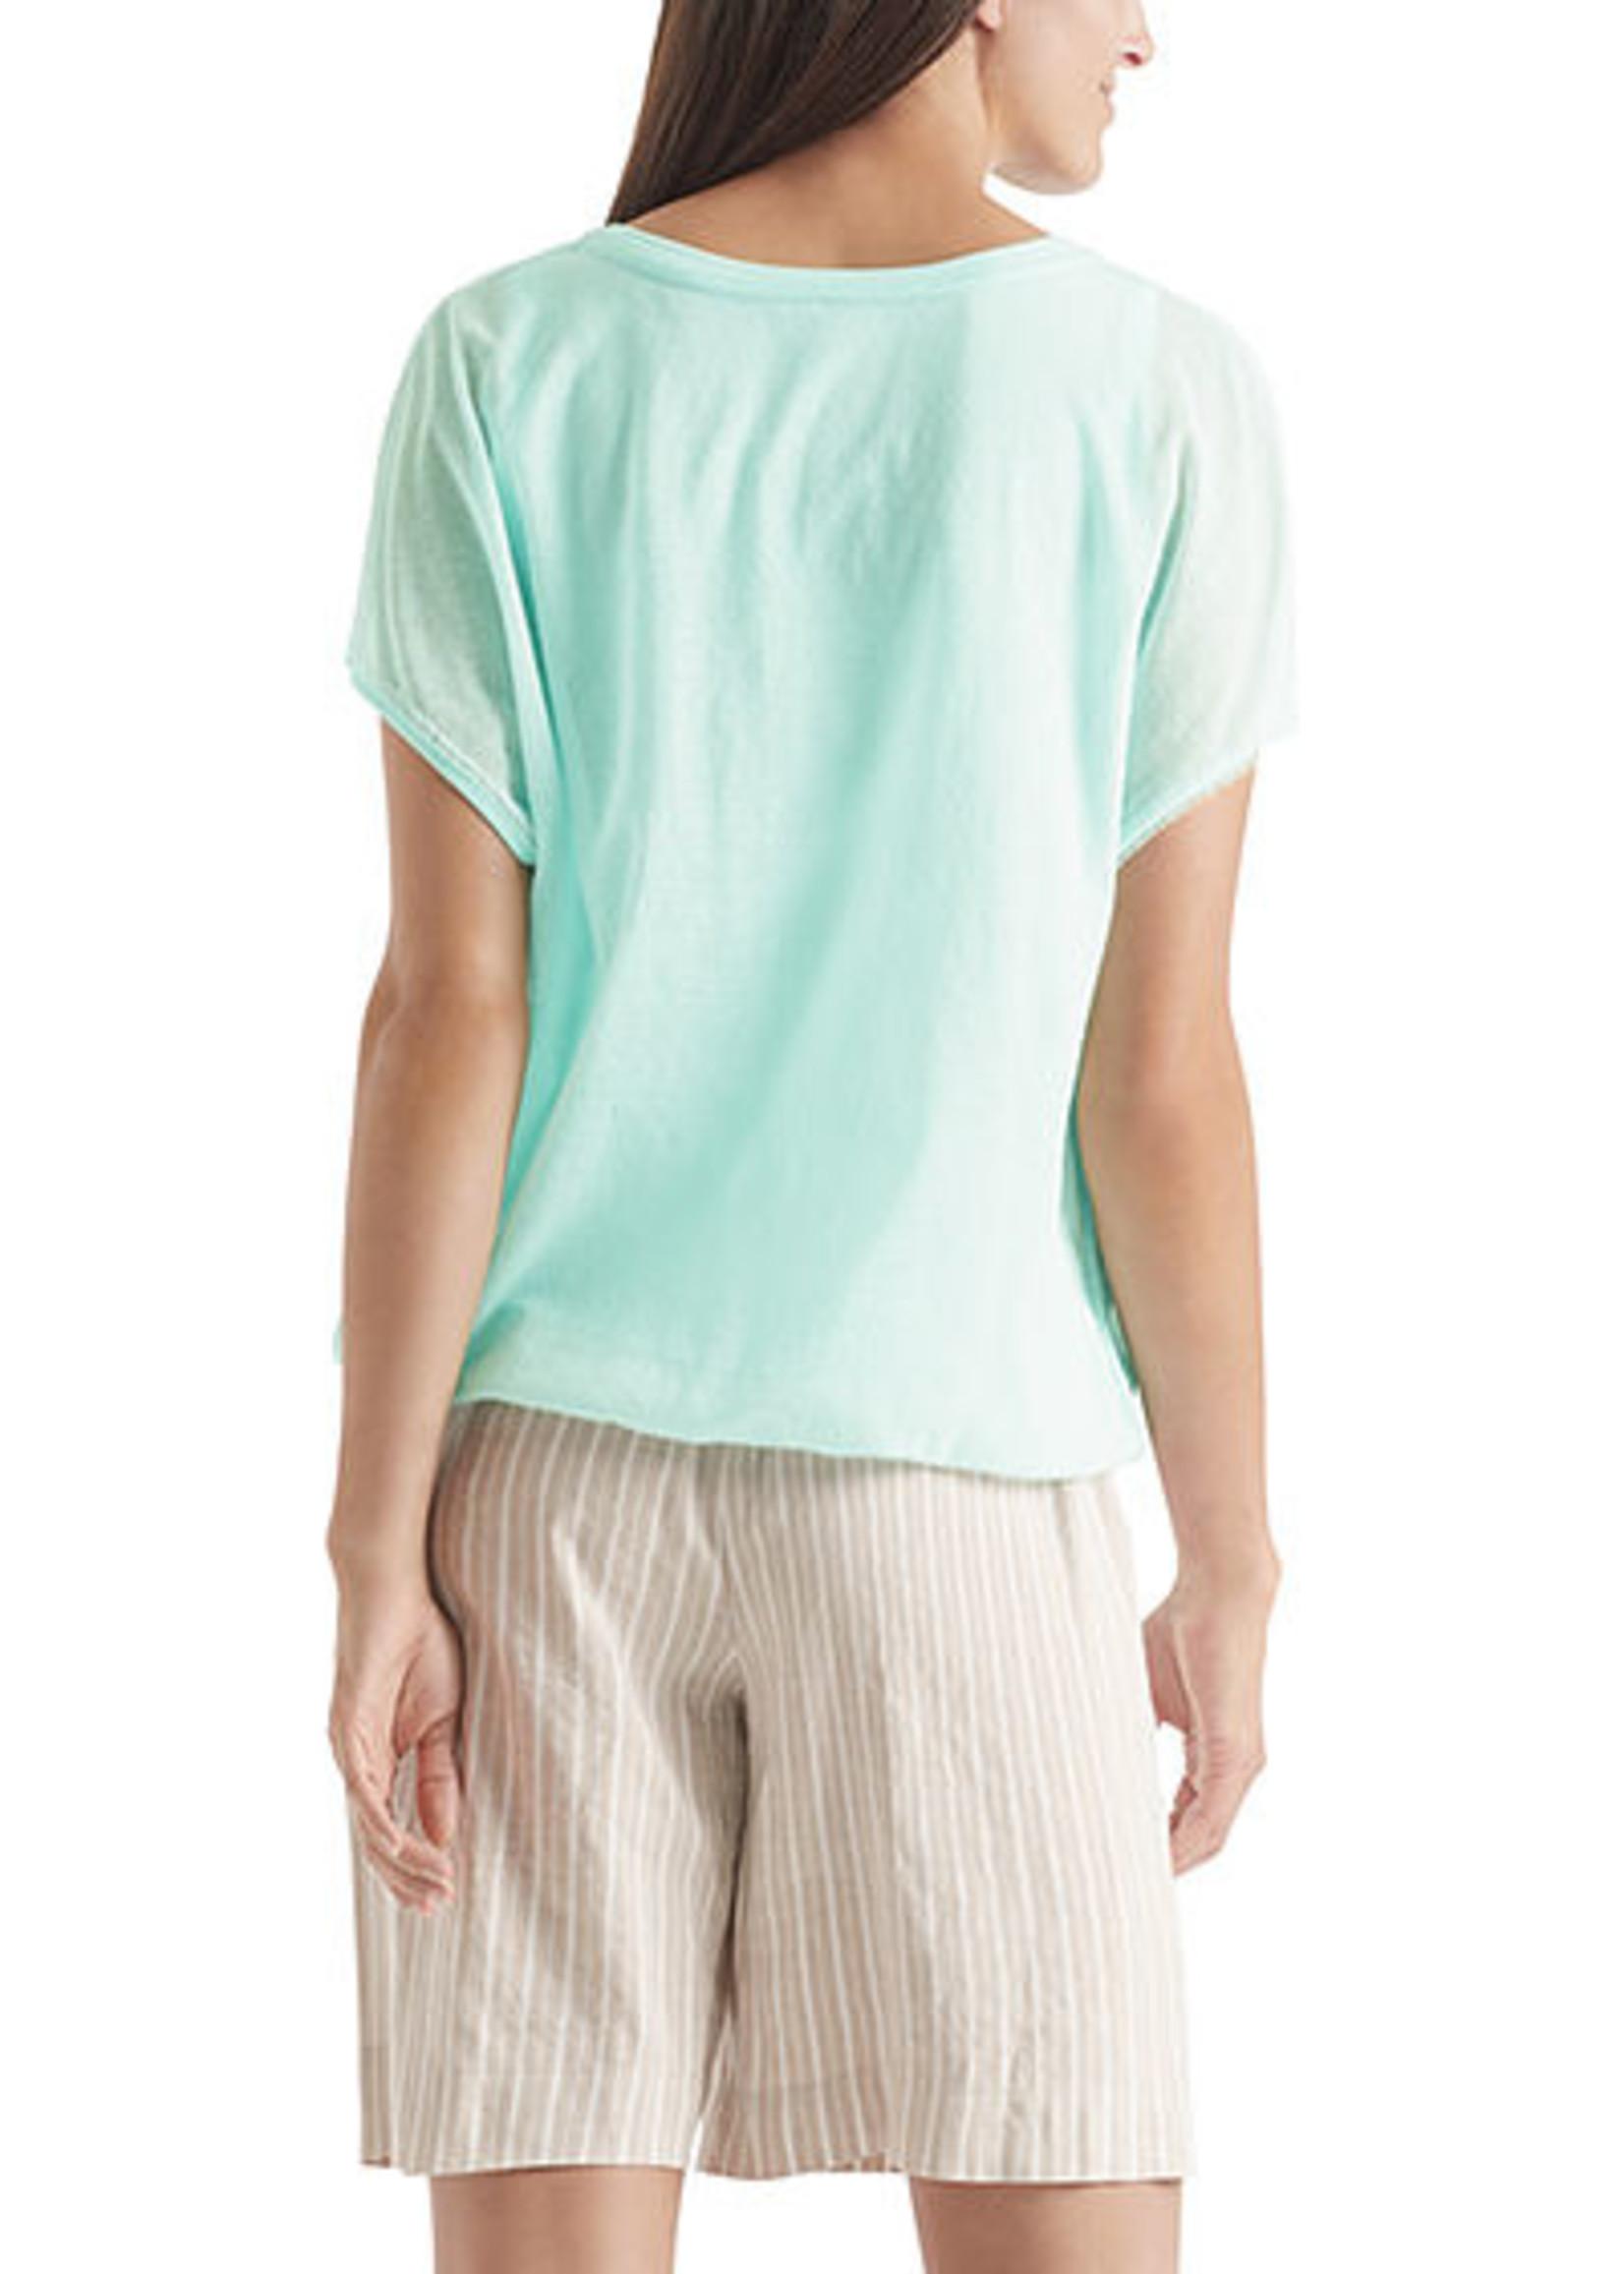 Sweater QC 41.55 M31